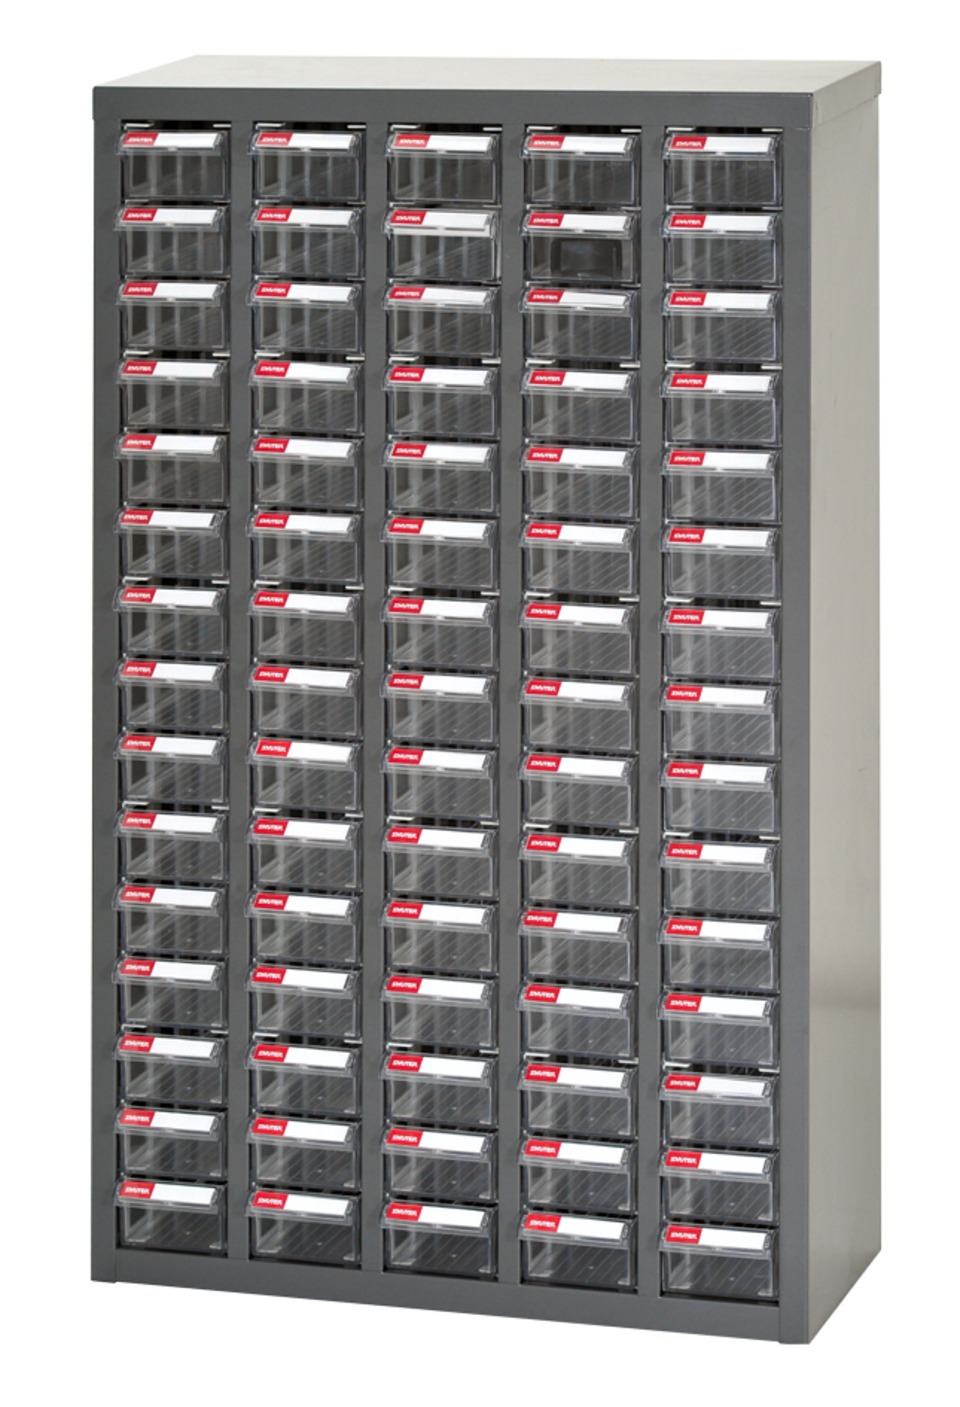 Shuter Revolving Tower Hanging Bins 57daf71aaa23c